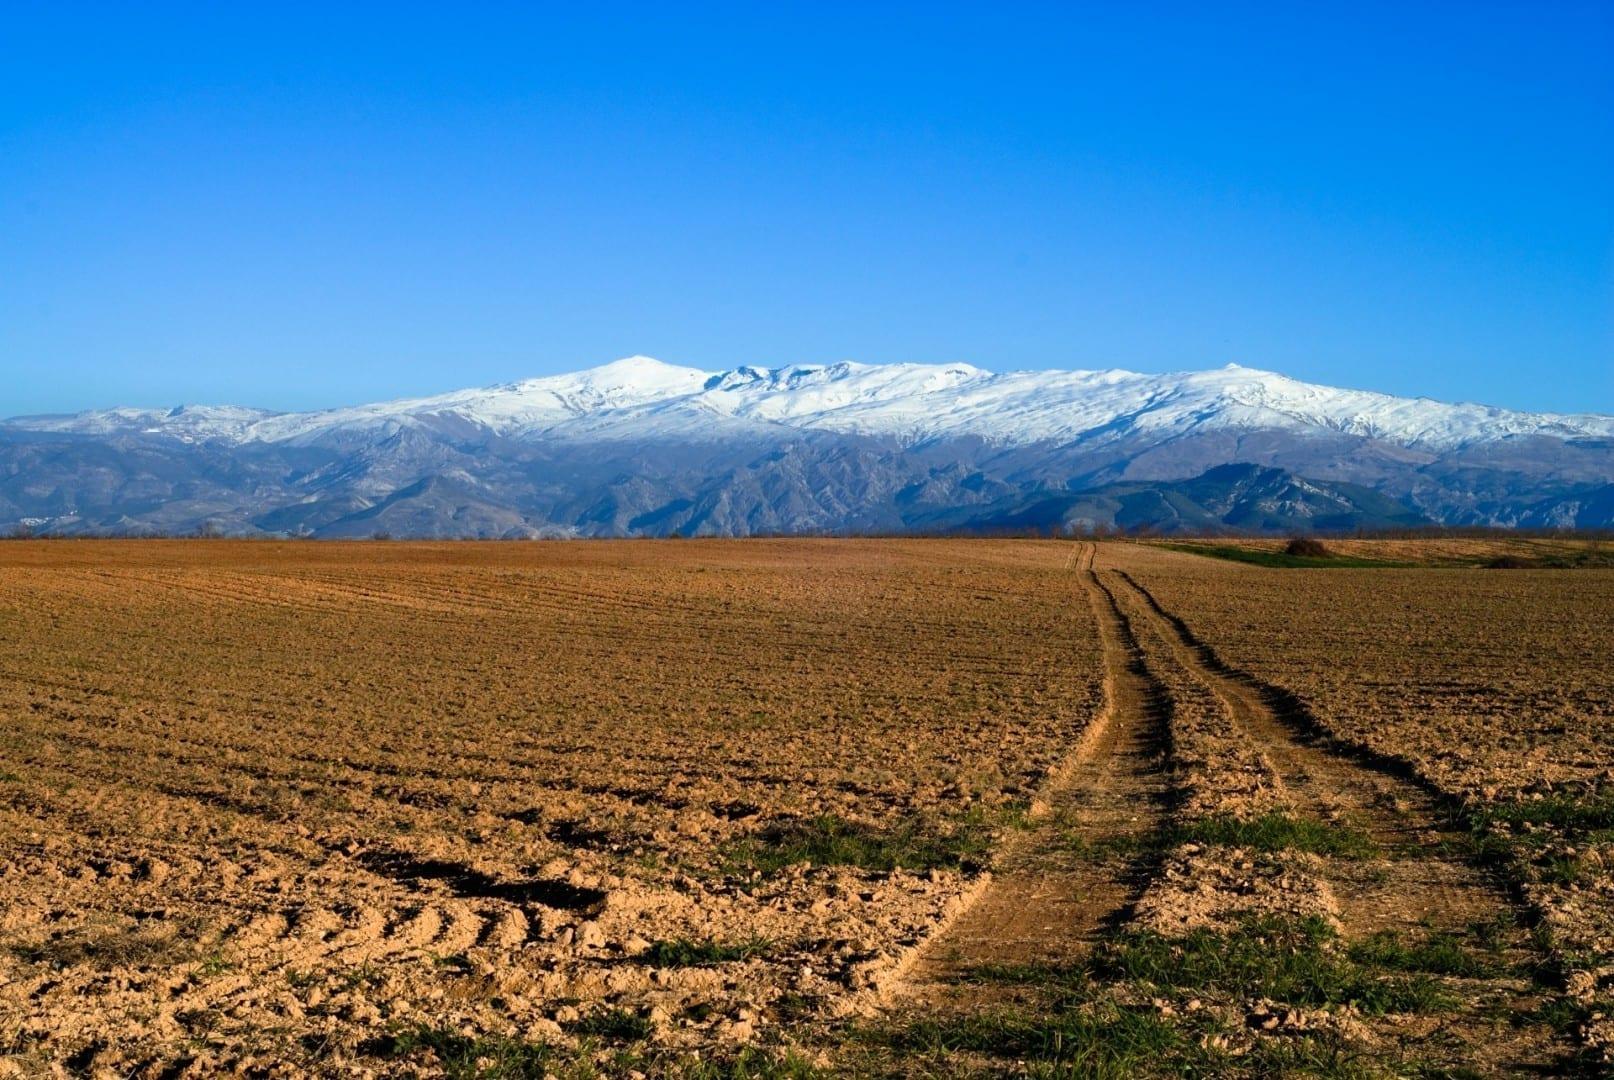 Sierra Nevada Sierra Nevada España